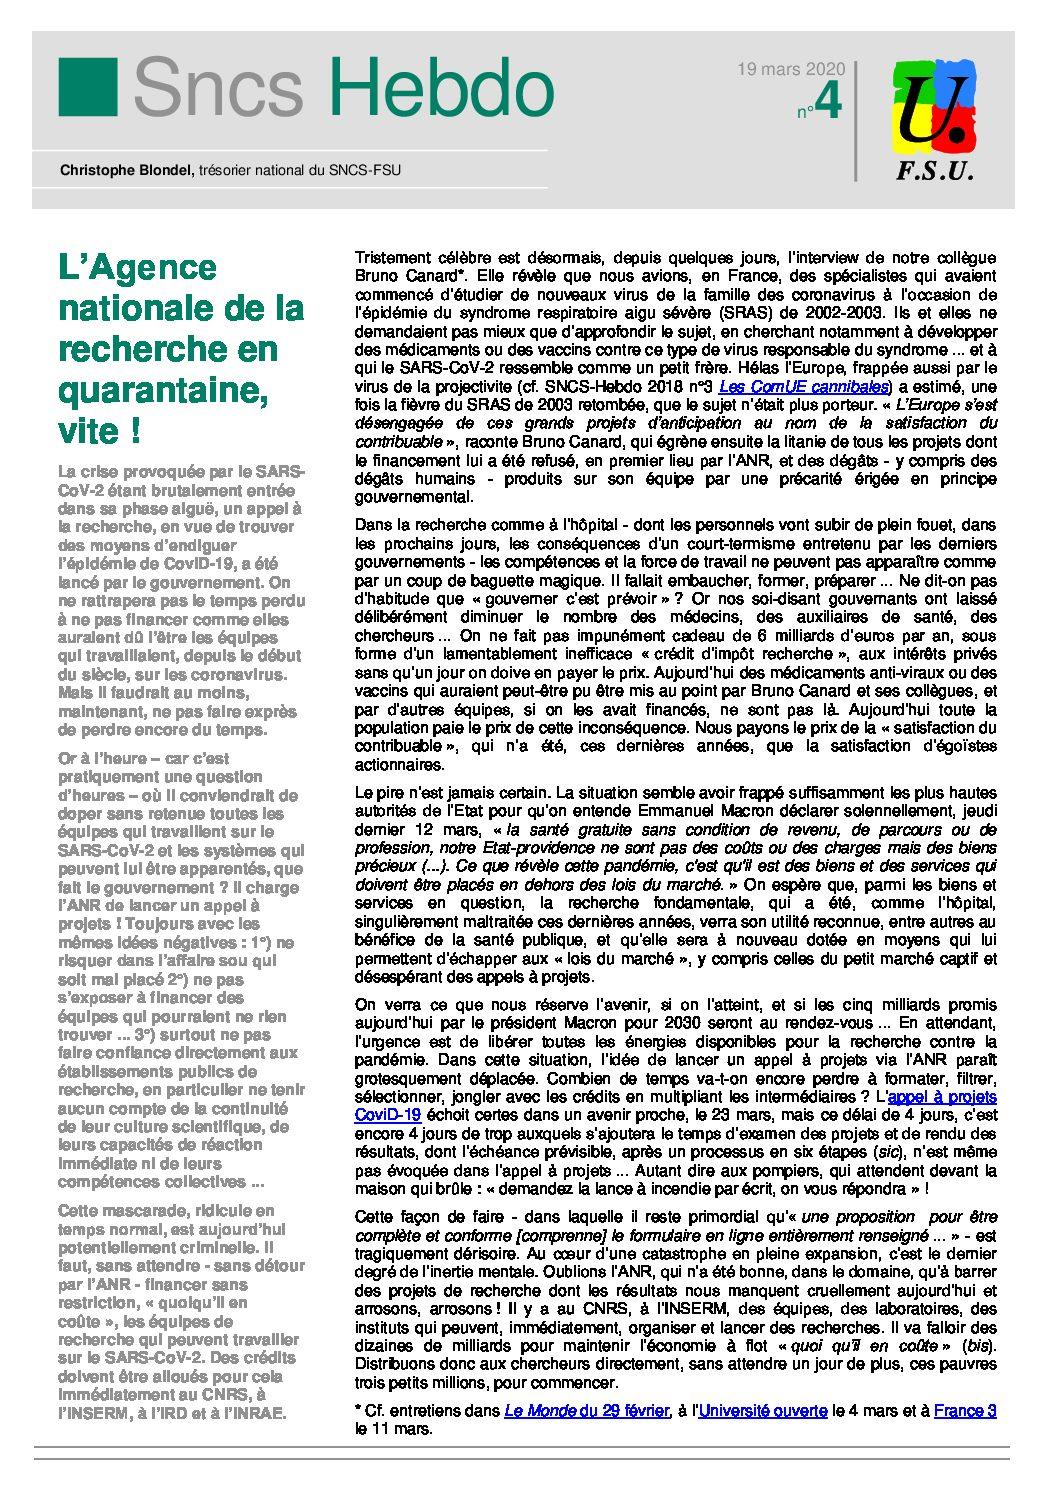 SNCSHEBDO20N°4-1-pdf.jpg